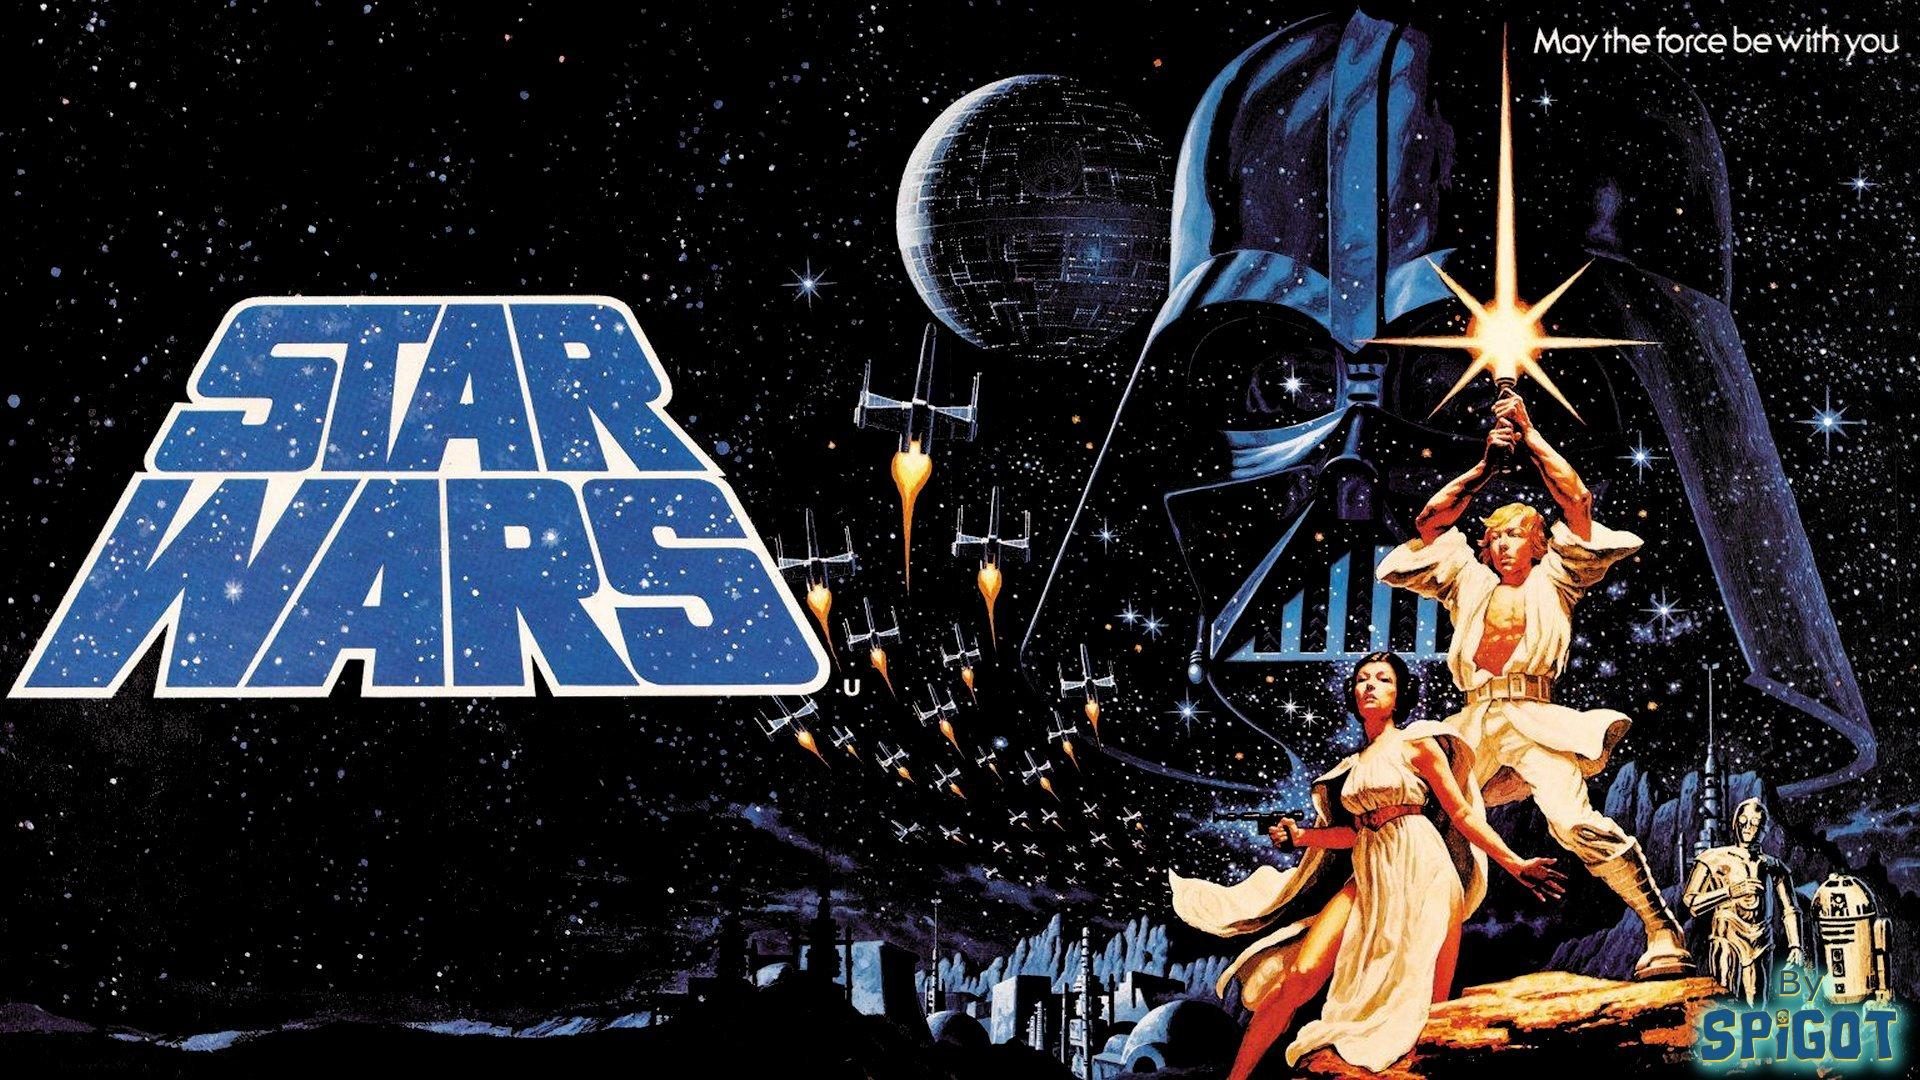 star wars wallpaper desktop theme under 1920x1080 1920x1080